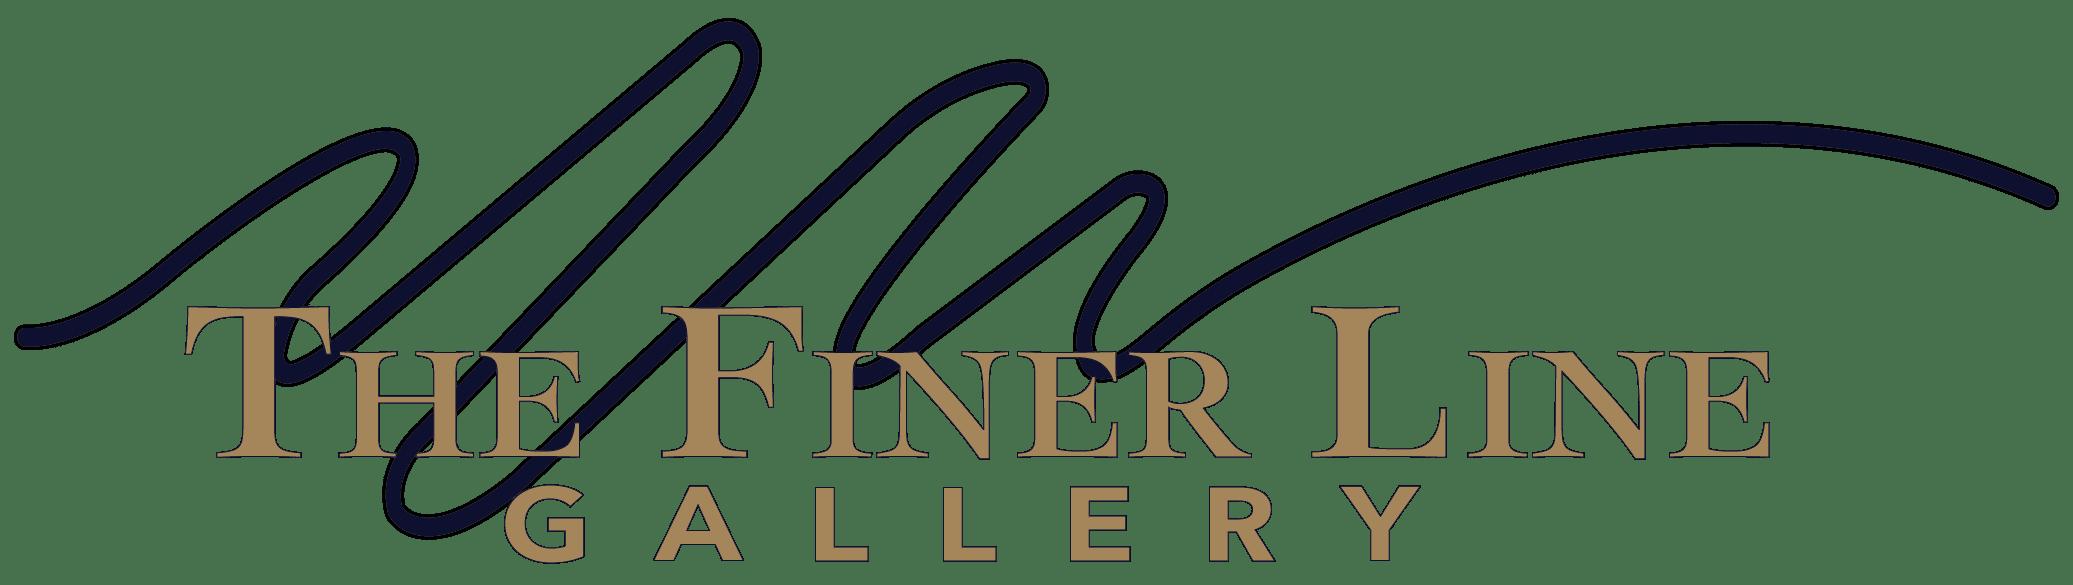 Finer Line Gallery